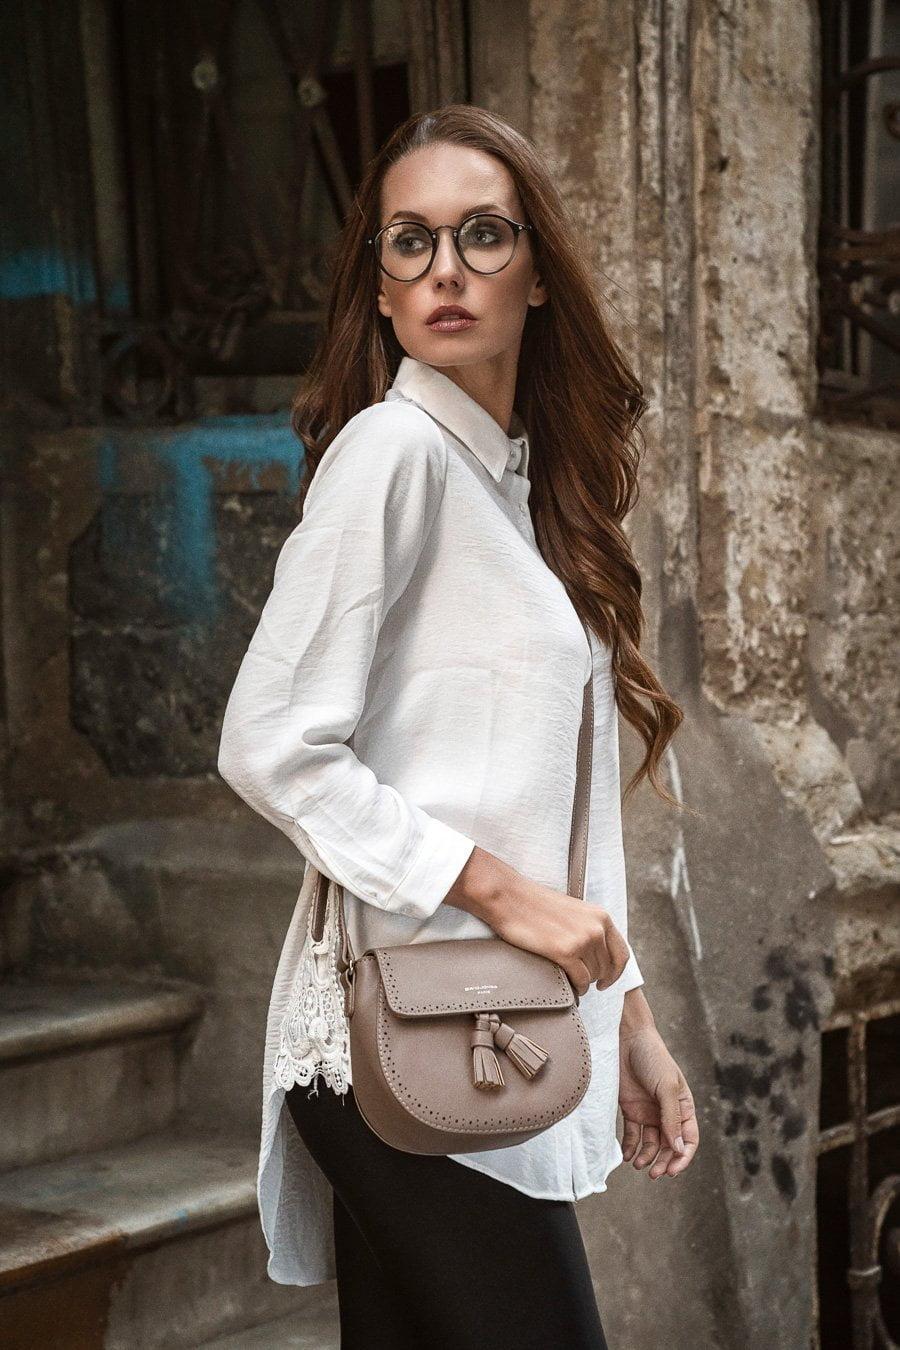 Moda Çekimi - Editorial - Beauty moda tekstil burakbulutfotografatolyesi 32